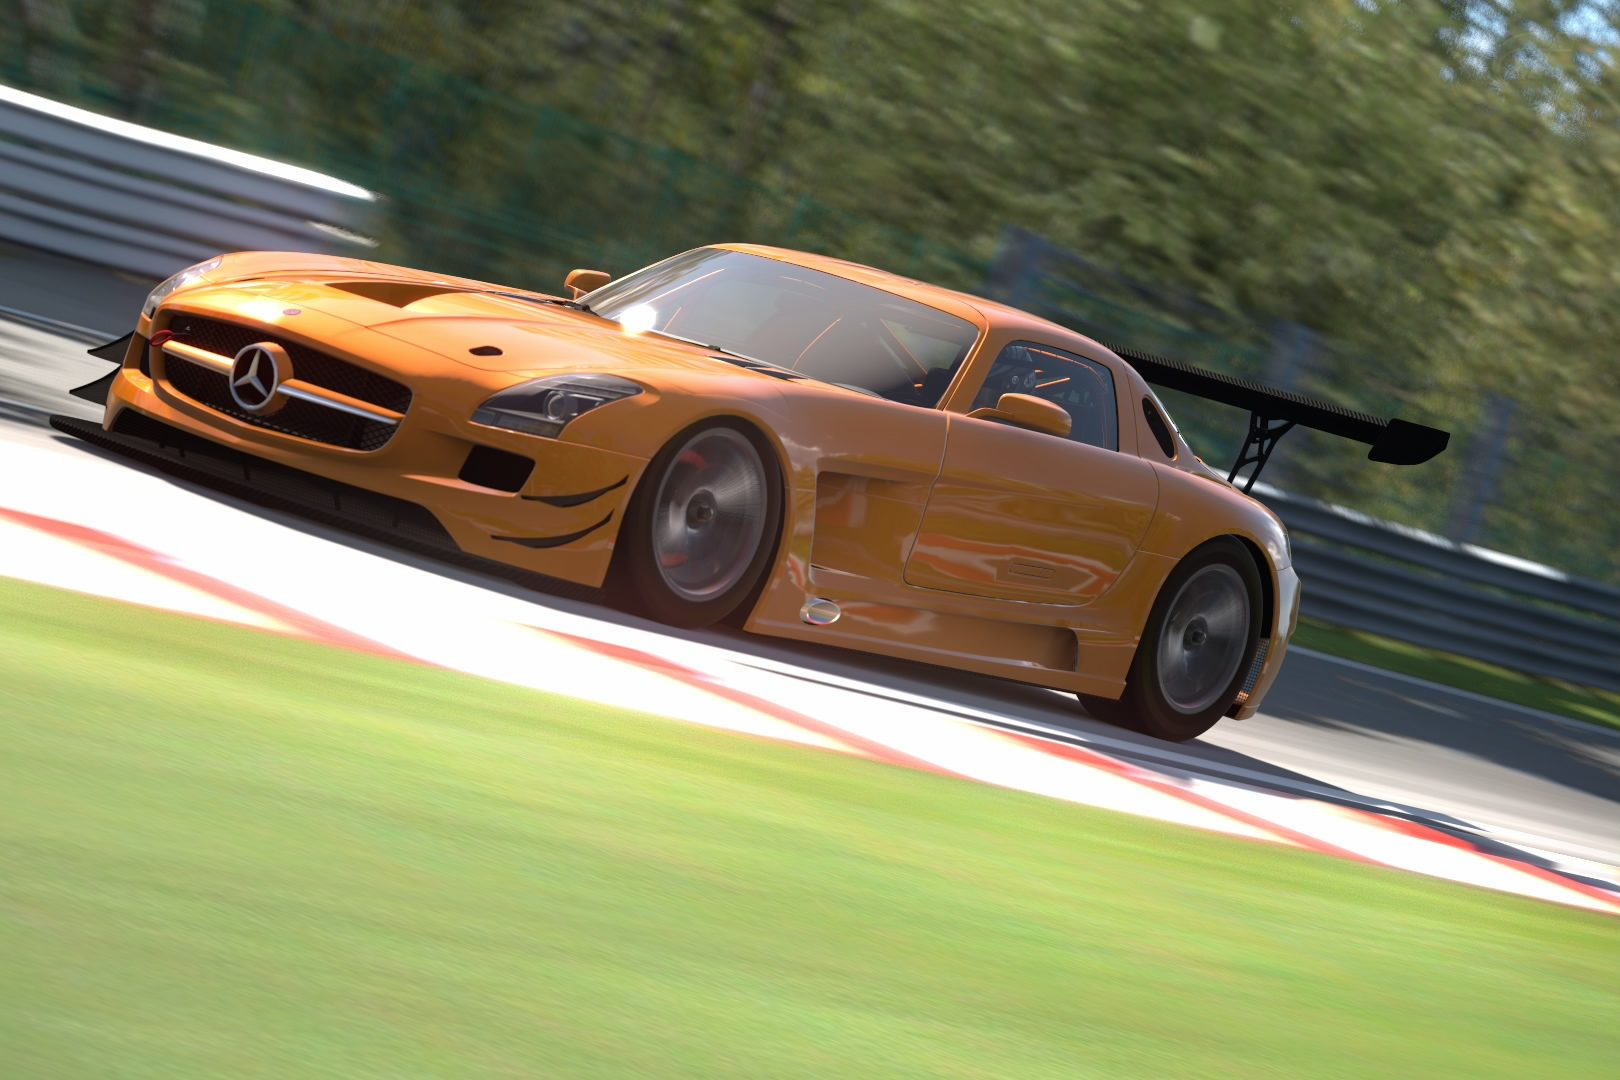 Mercedes-Benz SLS AMG GT3 '11 (Car).jpg